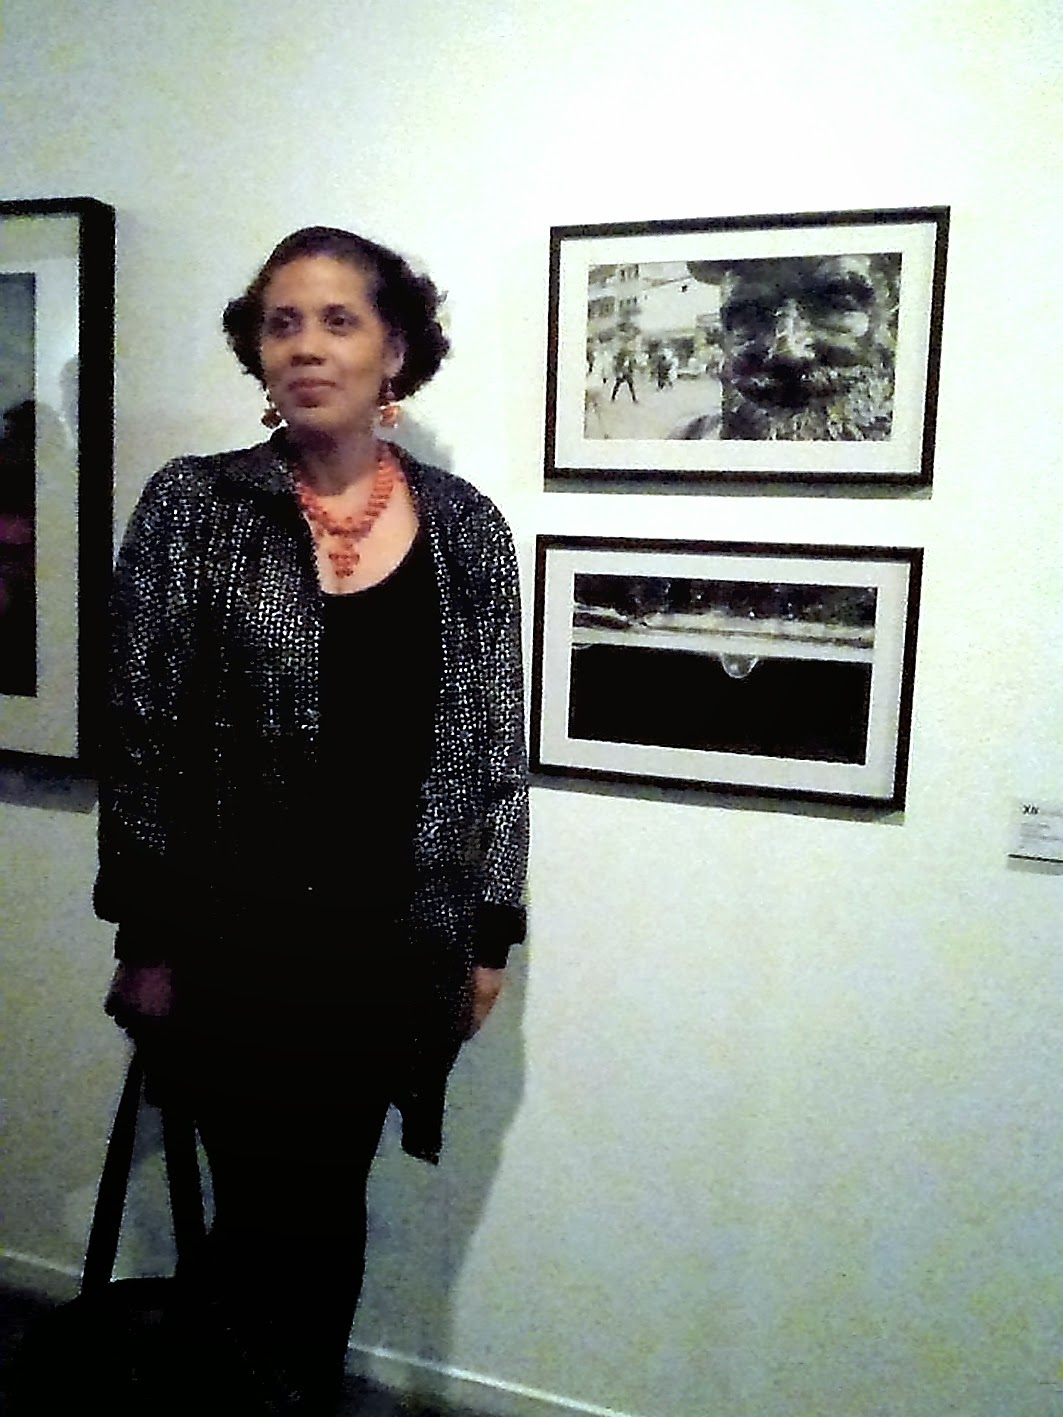 La Espera Fotografía B&N digital Gladys Calzadilla